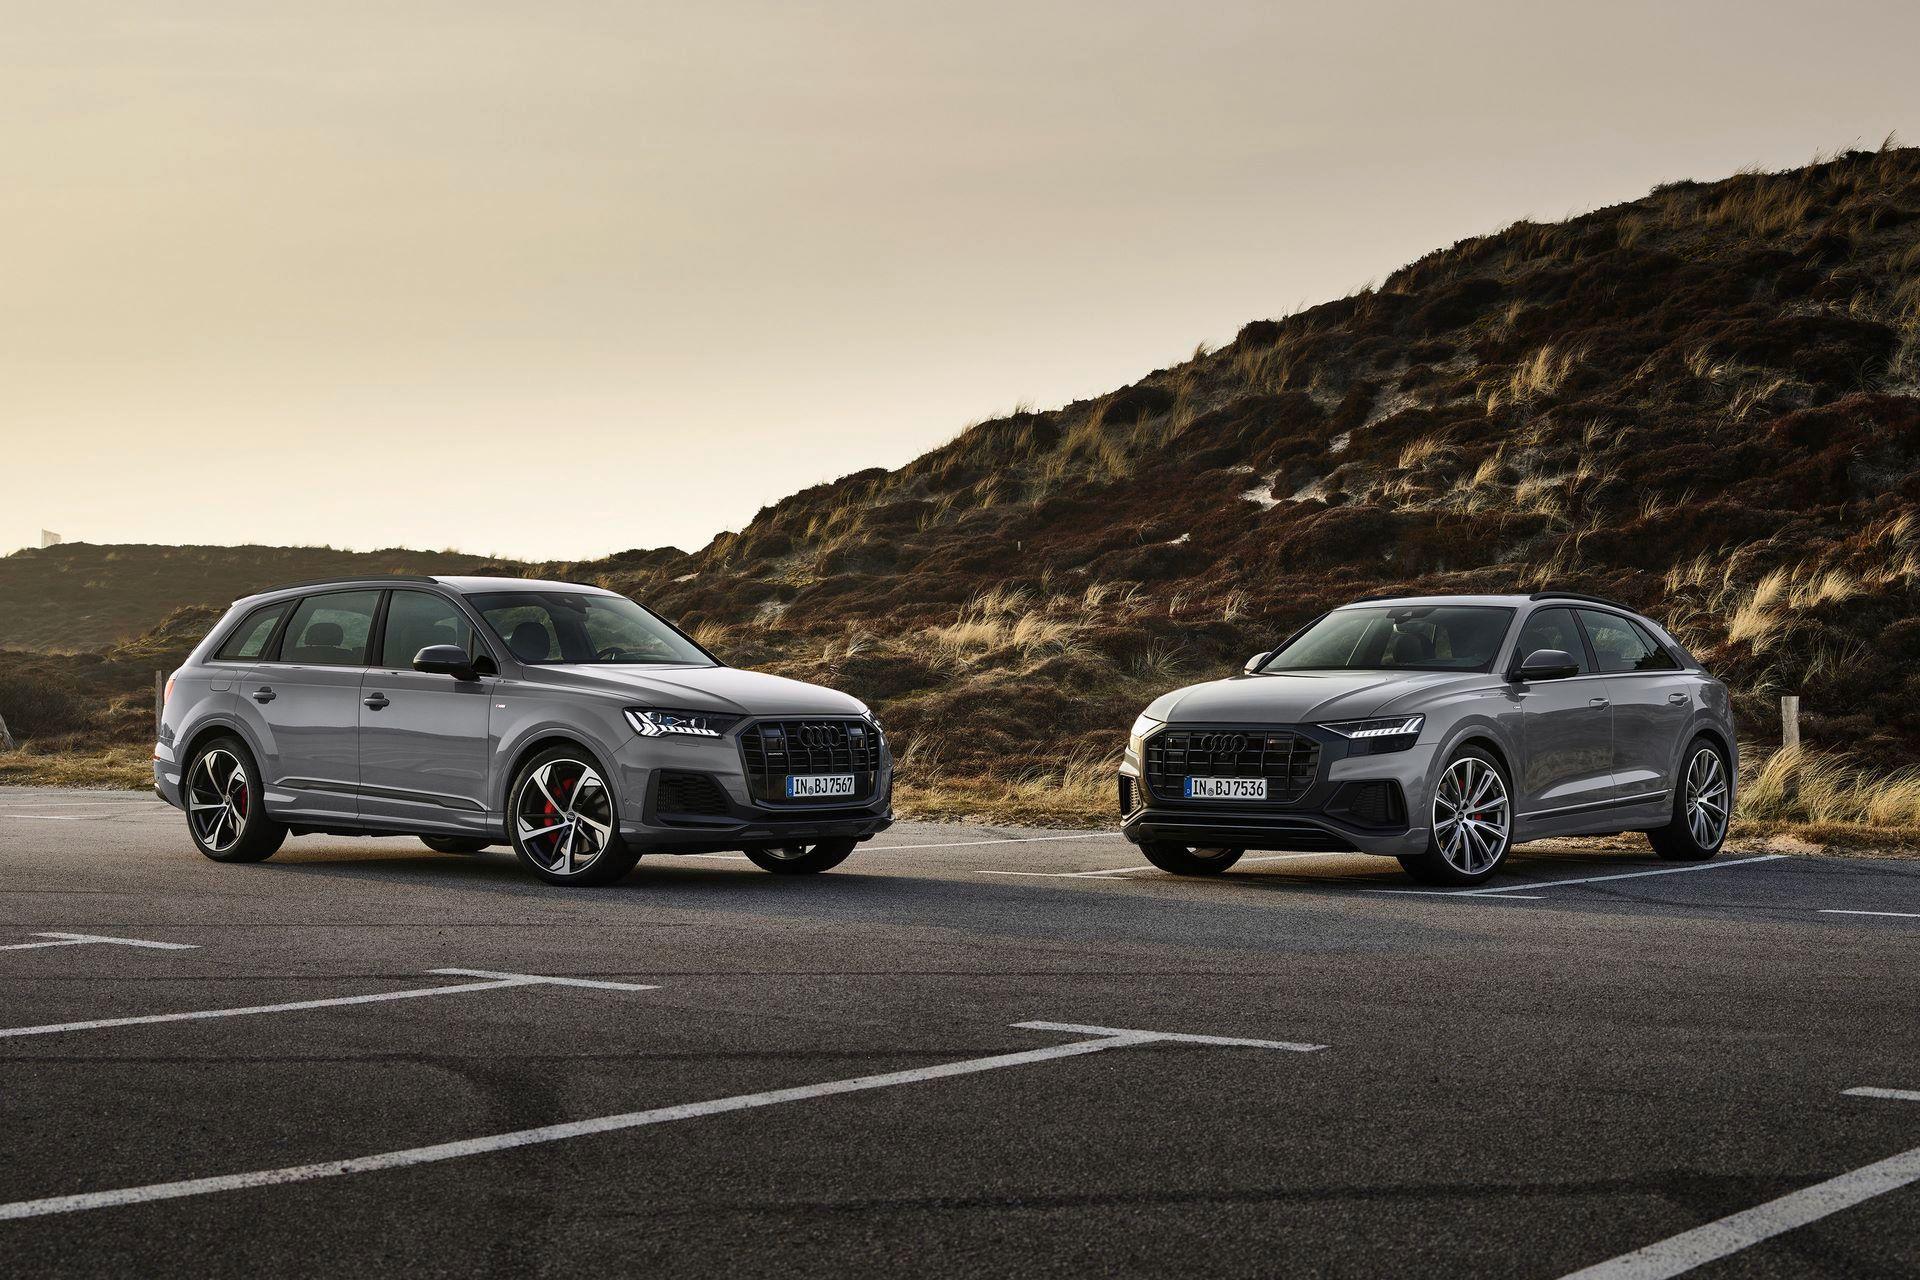 1_Audi-A4-A5-Q7-Q8-Competition-And-Competition-Plus-Trims-1